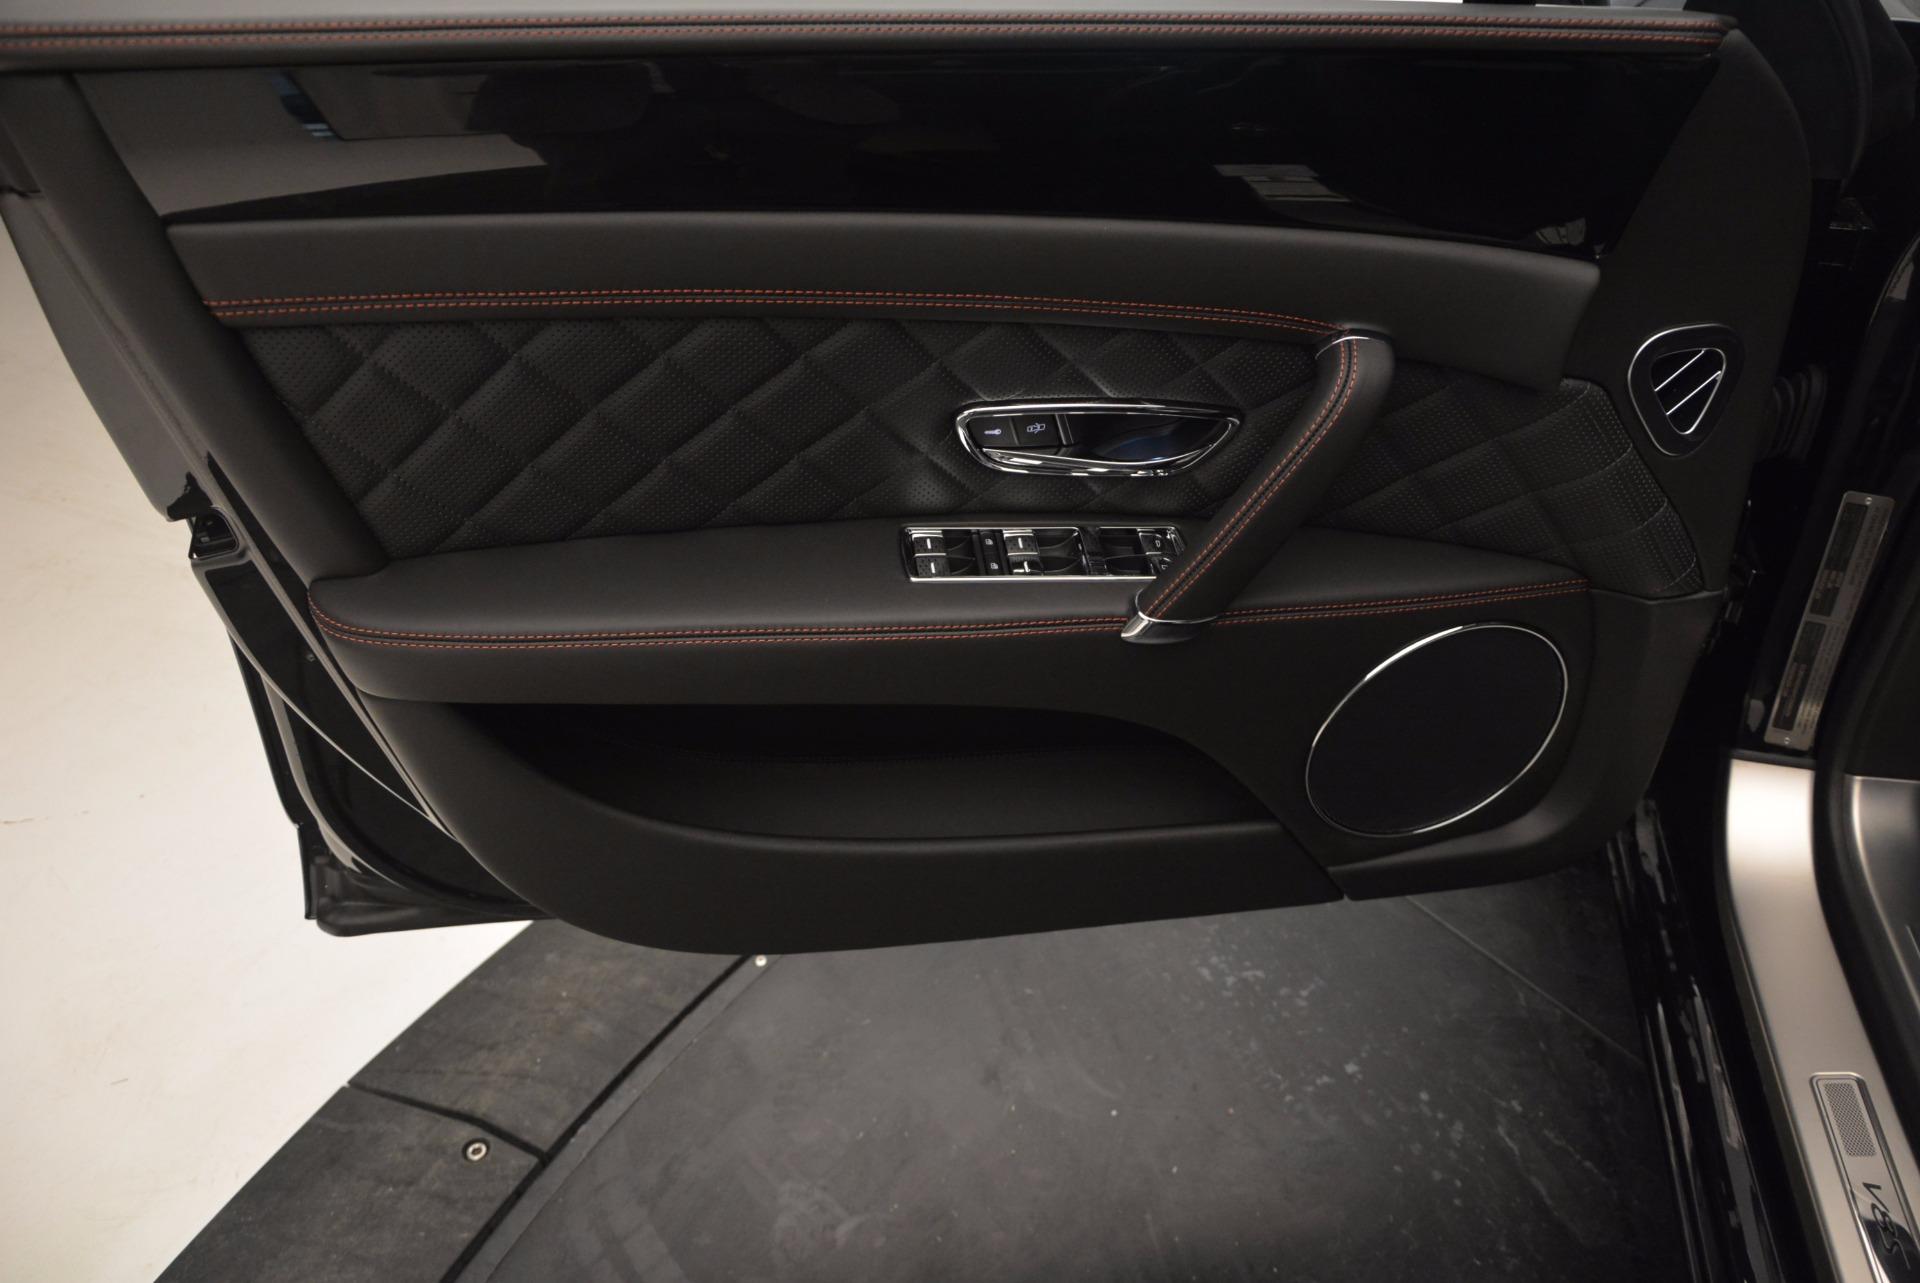 Used 2017 Bentley Flying Spur V8 S For Sale In Westport, CT 732_p17